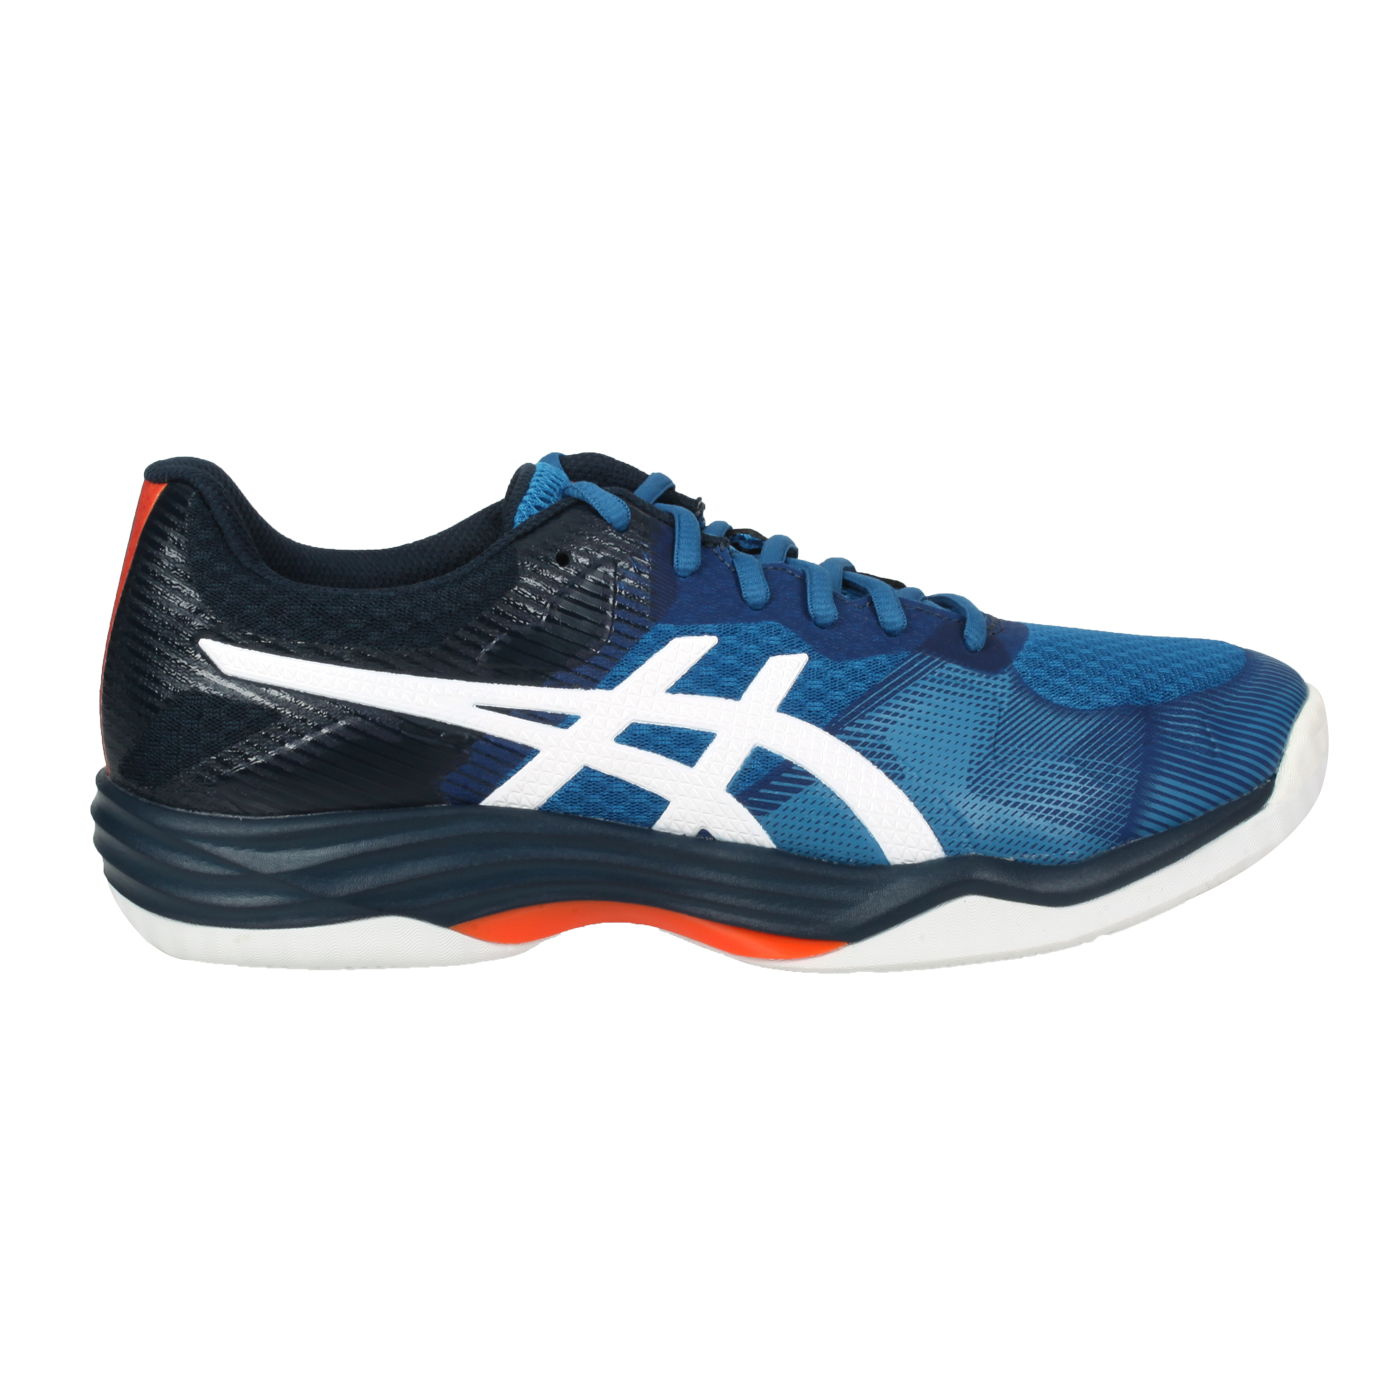 ASICS 男款排羽球鞋  @GEL-TACTIC1071A031-402 - 藍白橘